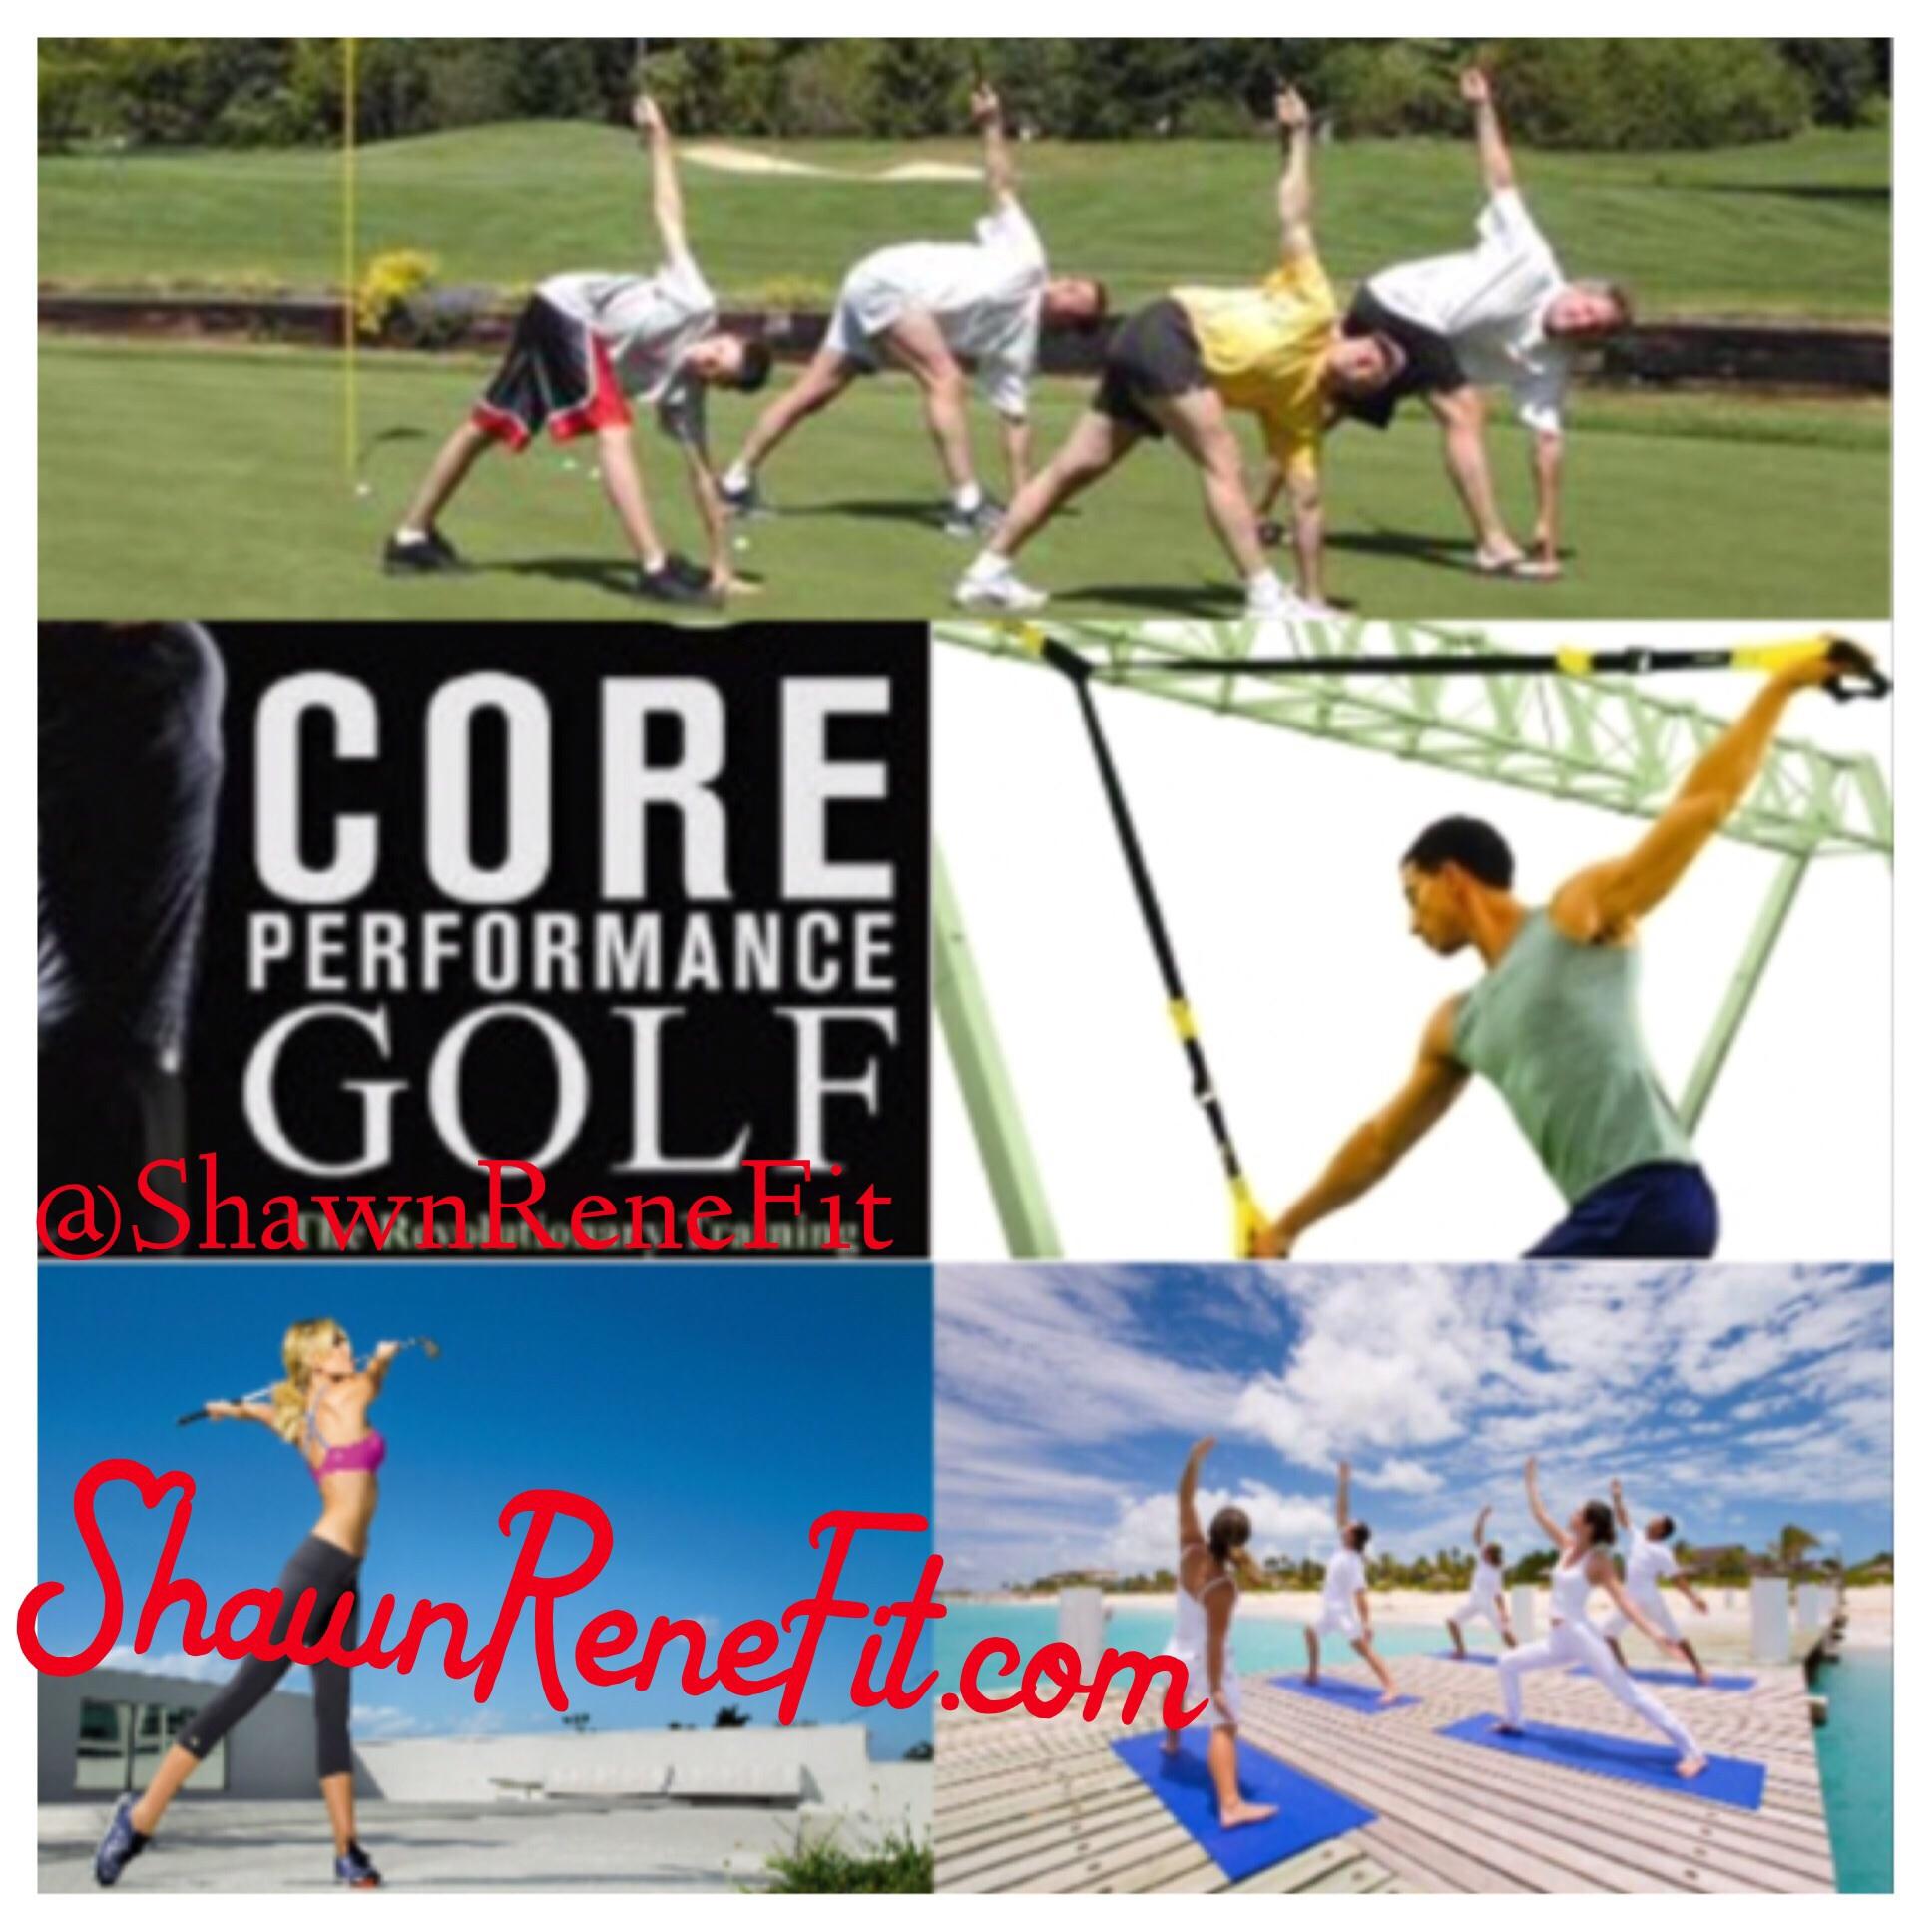 Shawn Rene Zimmerman golf workouts golf puma golf exercises core flexibility sports illustrated golf digest